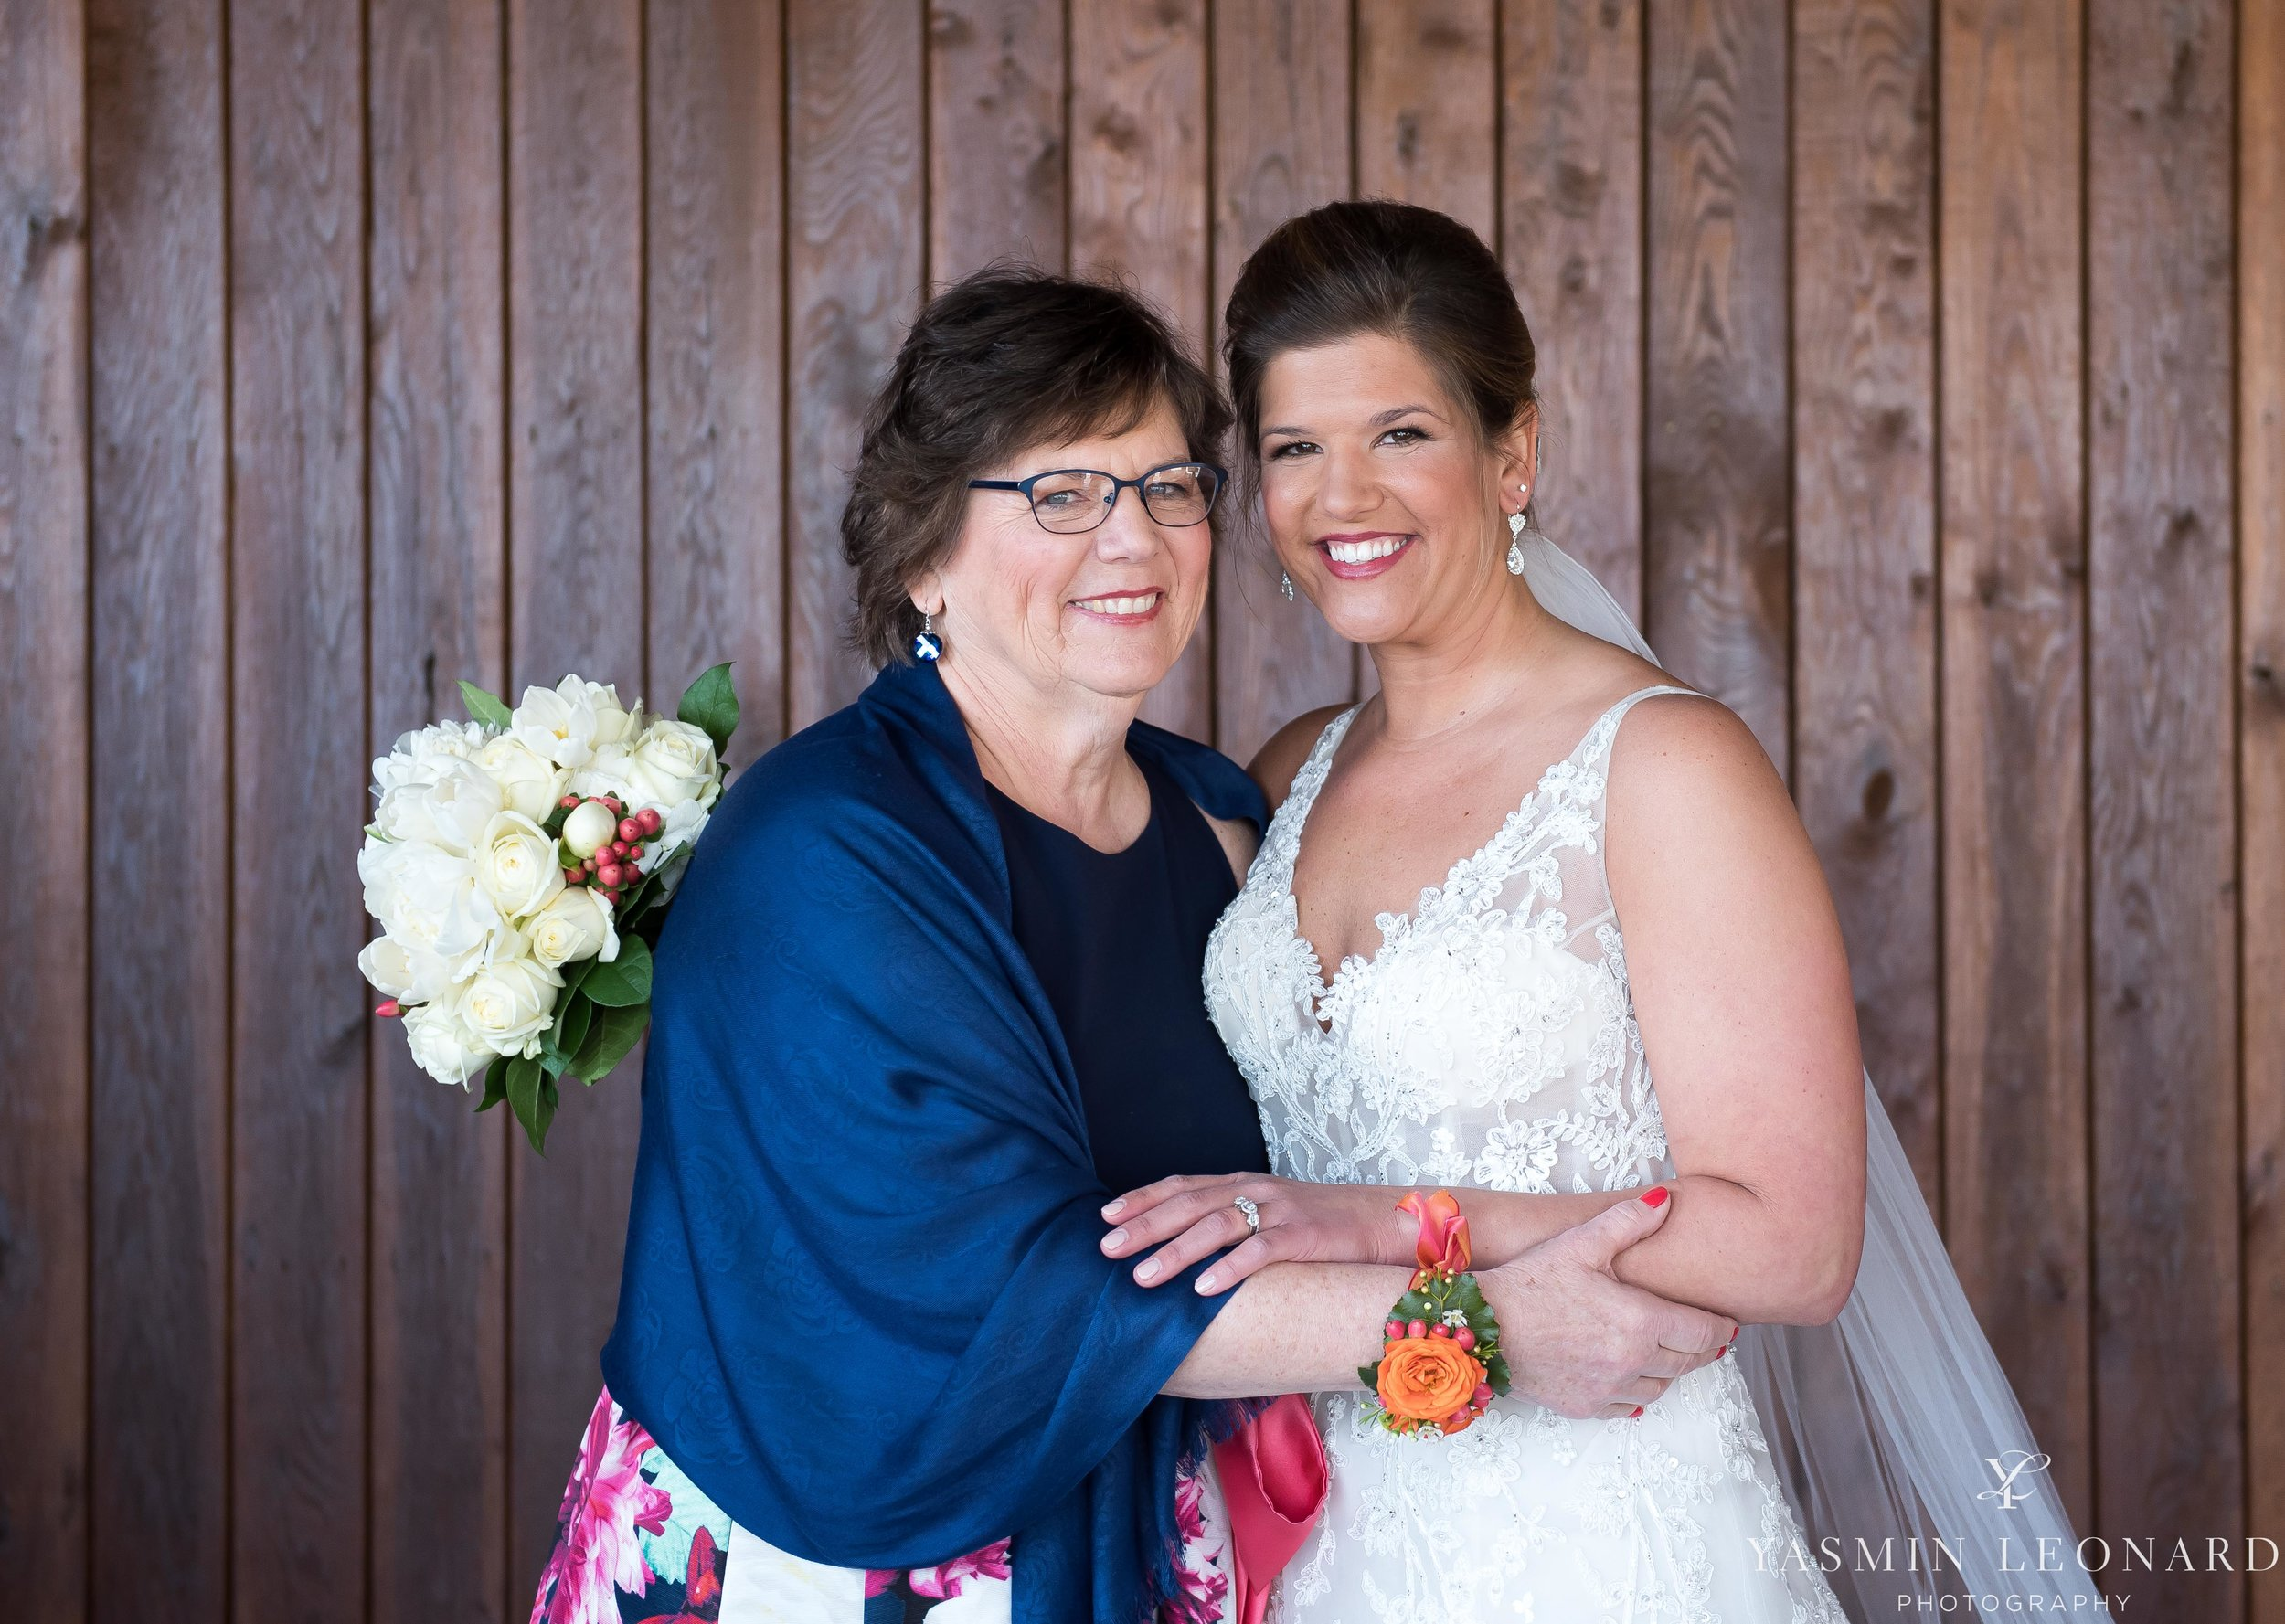 Adaumont Farm - Adaumont Farm Weddings - Trinity Weddings - NC Weddings - Yasmin Leonard Photography-18.jpg